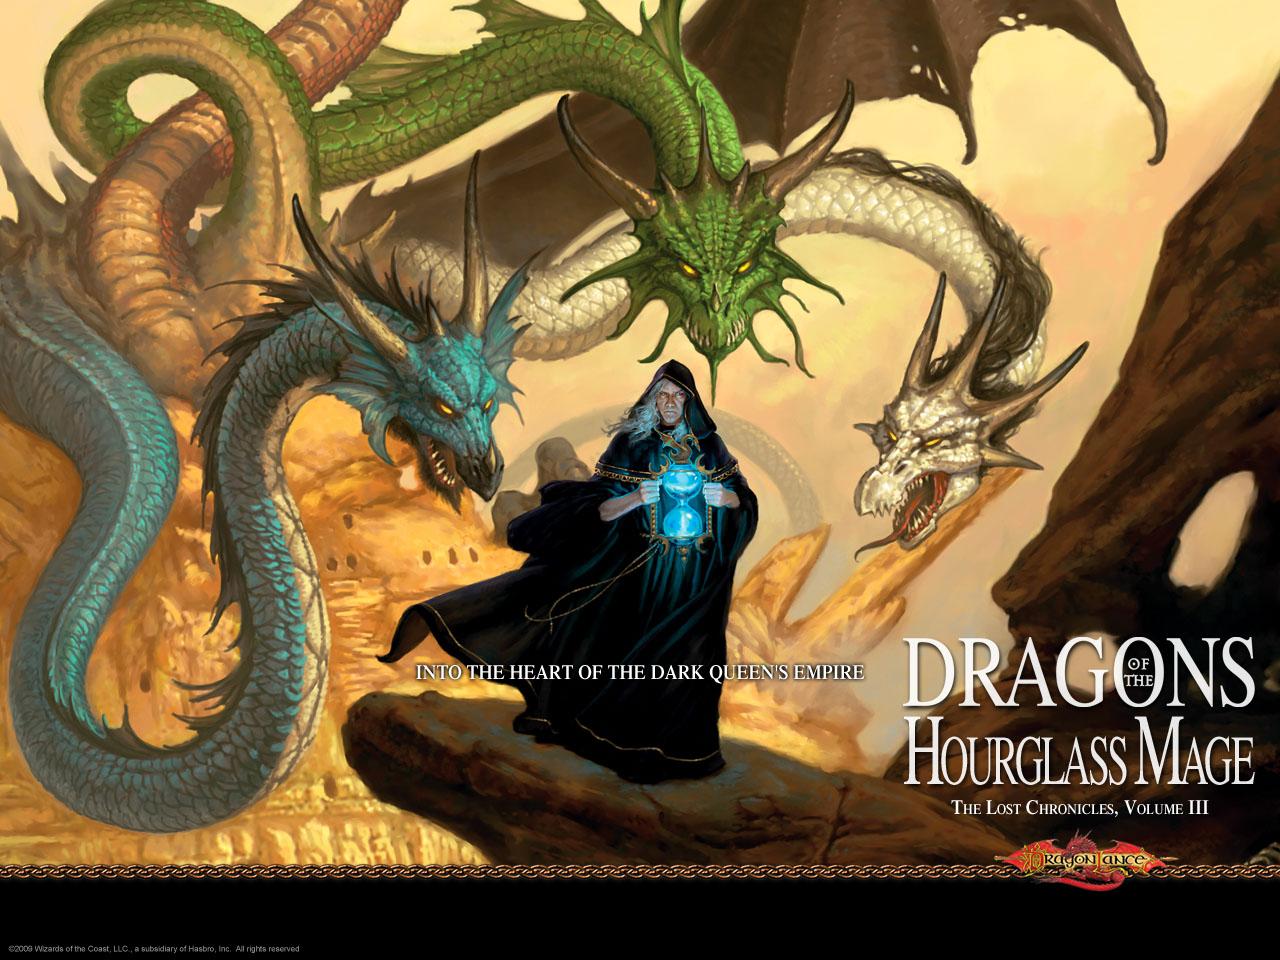 Sopars Dragonlance Page 1280x960